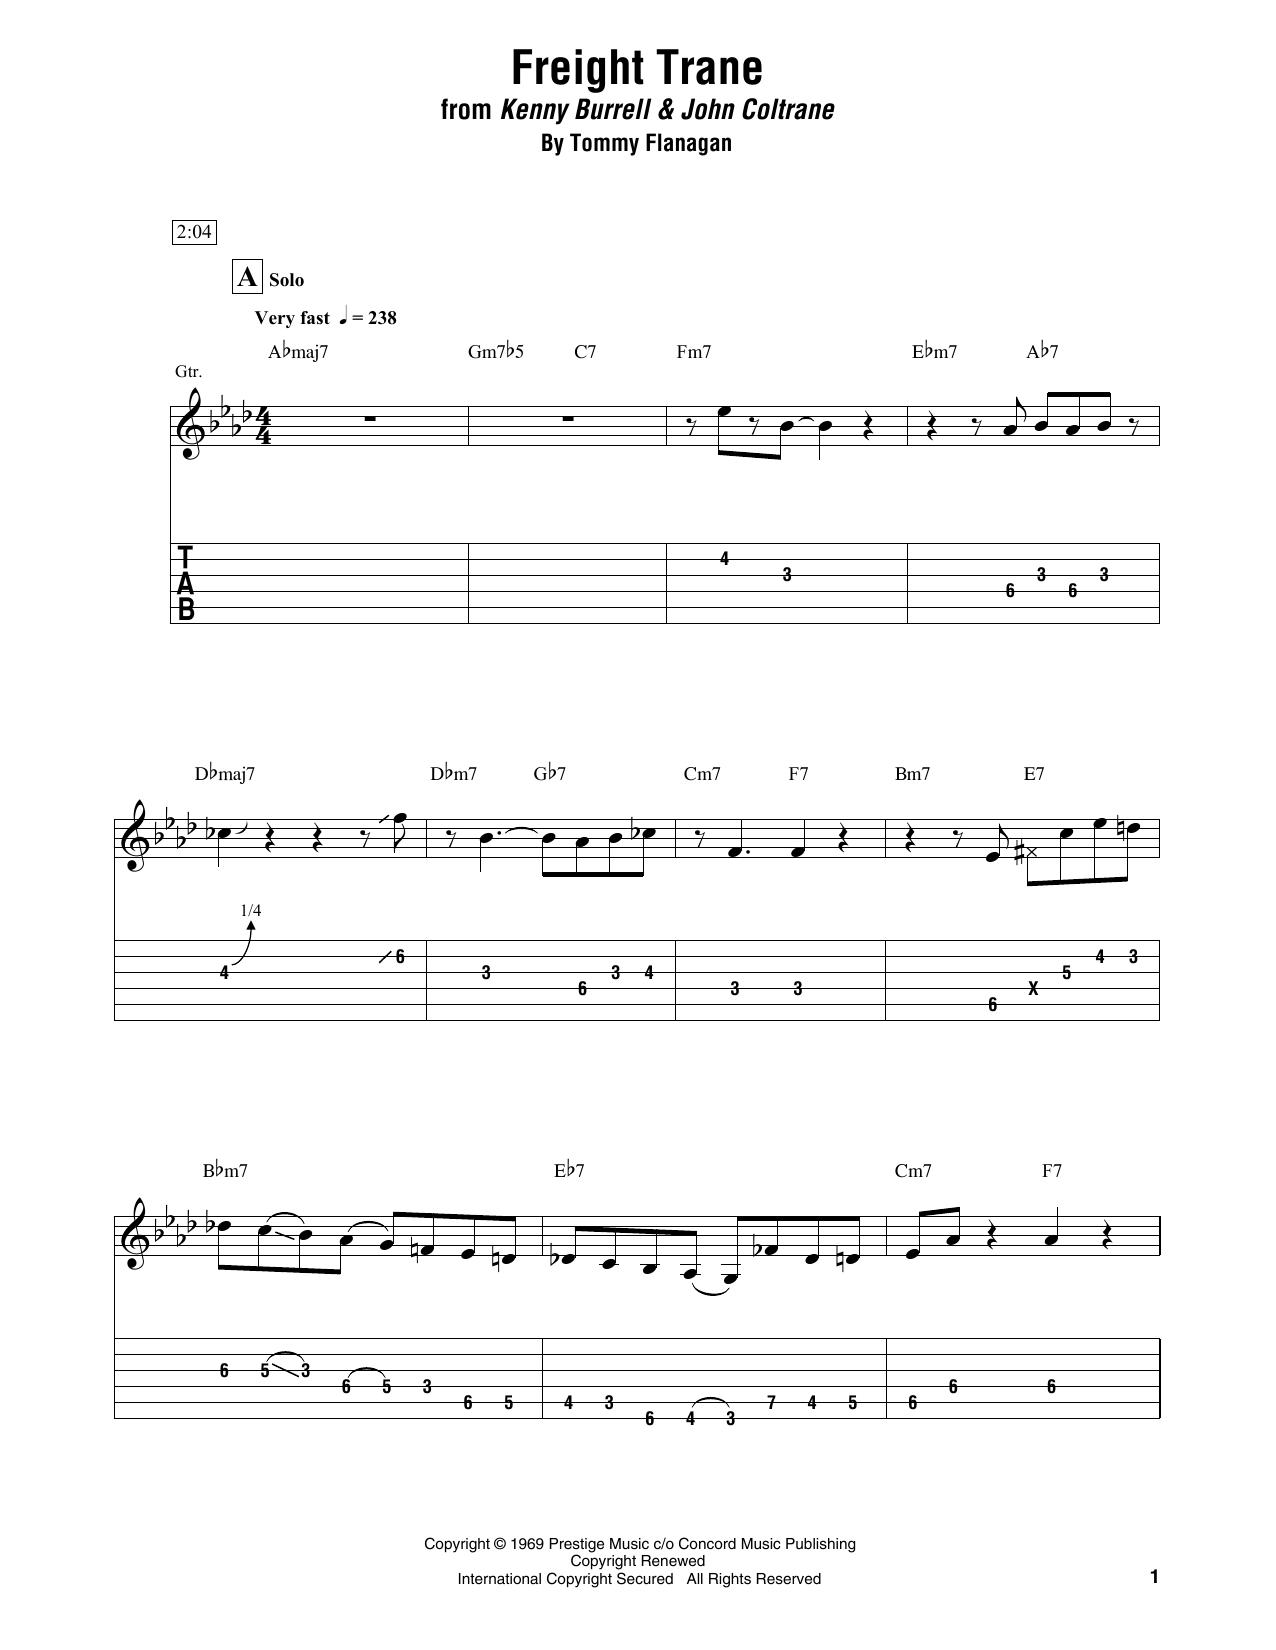 Freight Trane Sheet Music